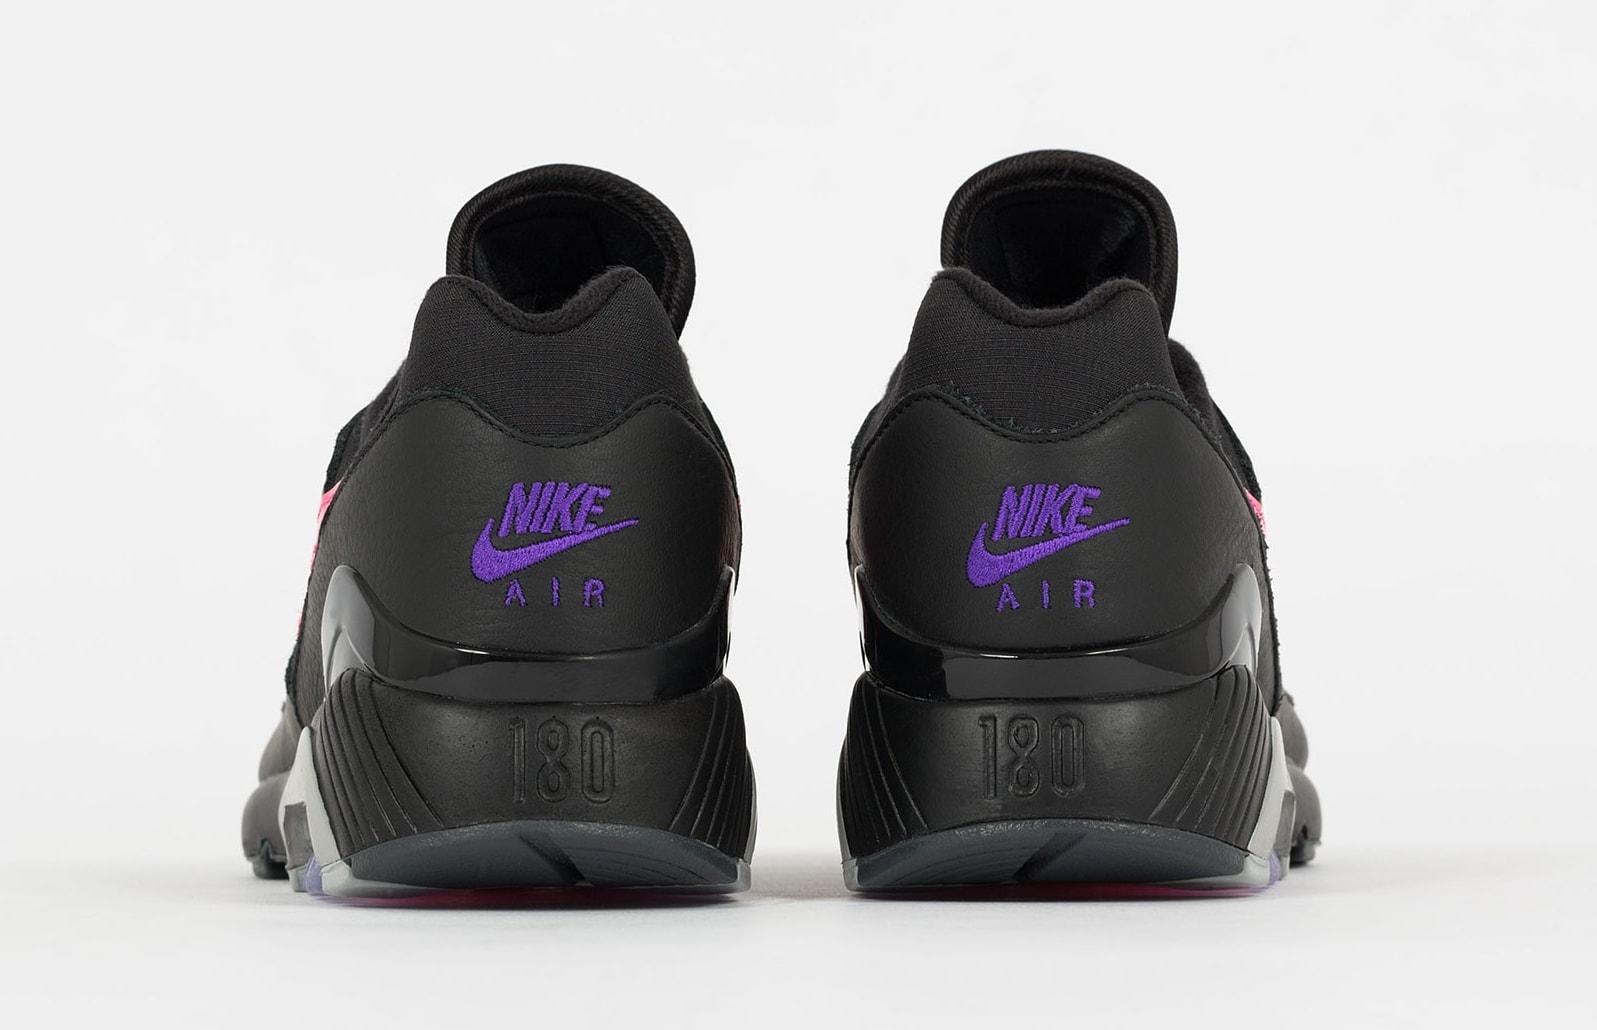 release date 70cea 1d3ce Nike Air Max 180 blackpink blastwolf grey - sommerprogramme.de